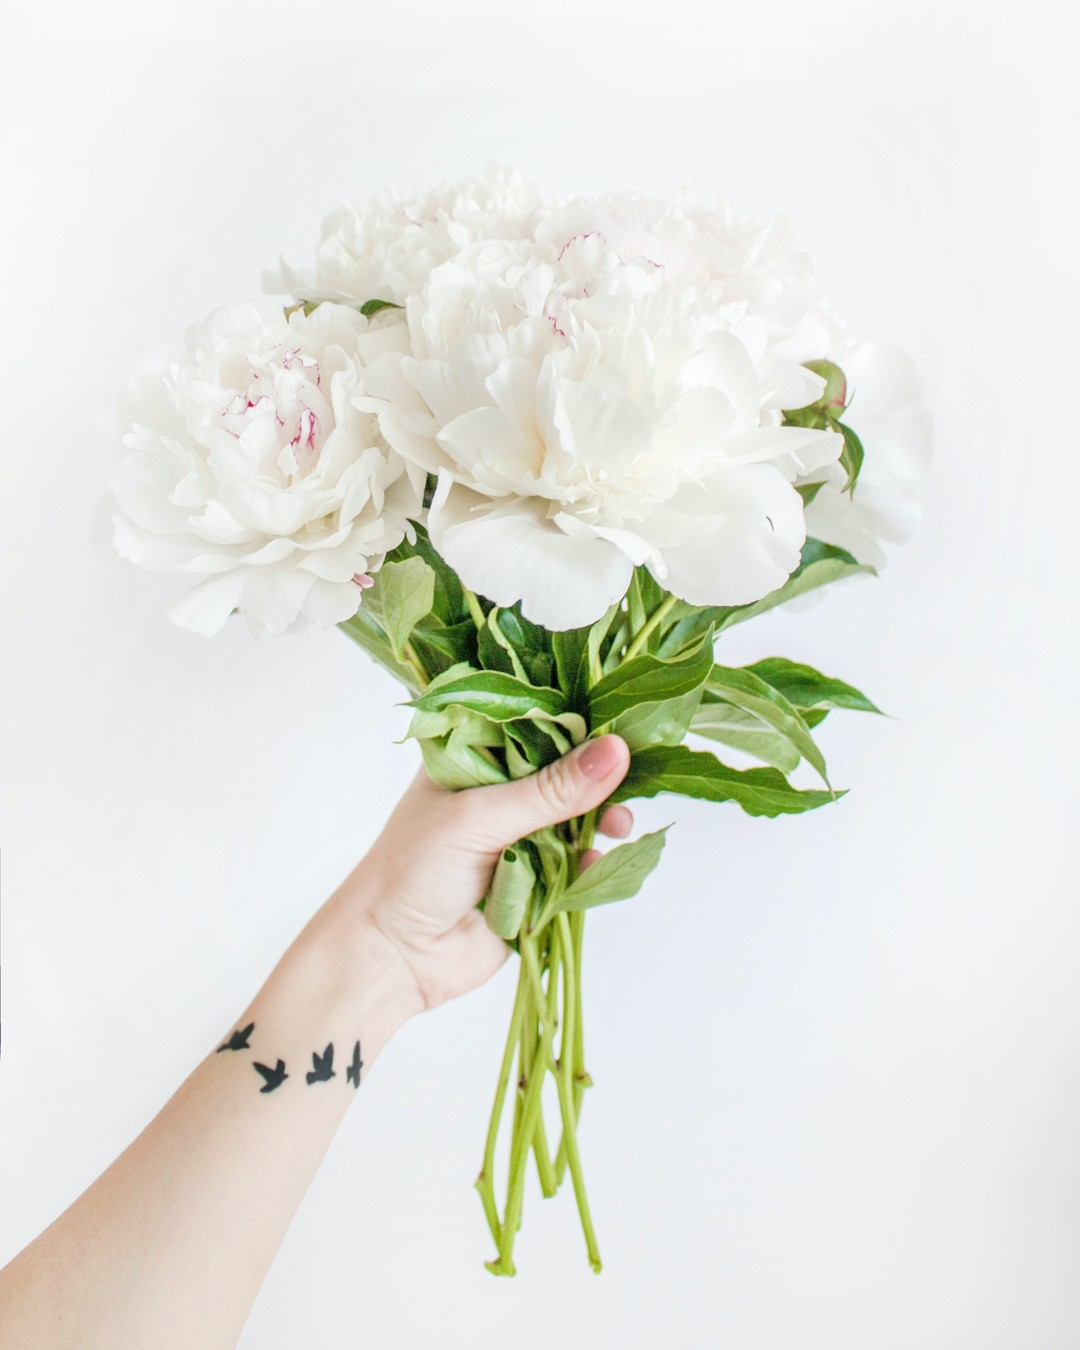 Hello may. #hellomay #springvibes #springflower #majowka2021 #flowers #flowerpower #feminine #delicate #may #witajmaj #majowo #maj #maj2021 #may2021 #mayflowers #whiteflowers #purebeauty